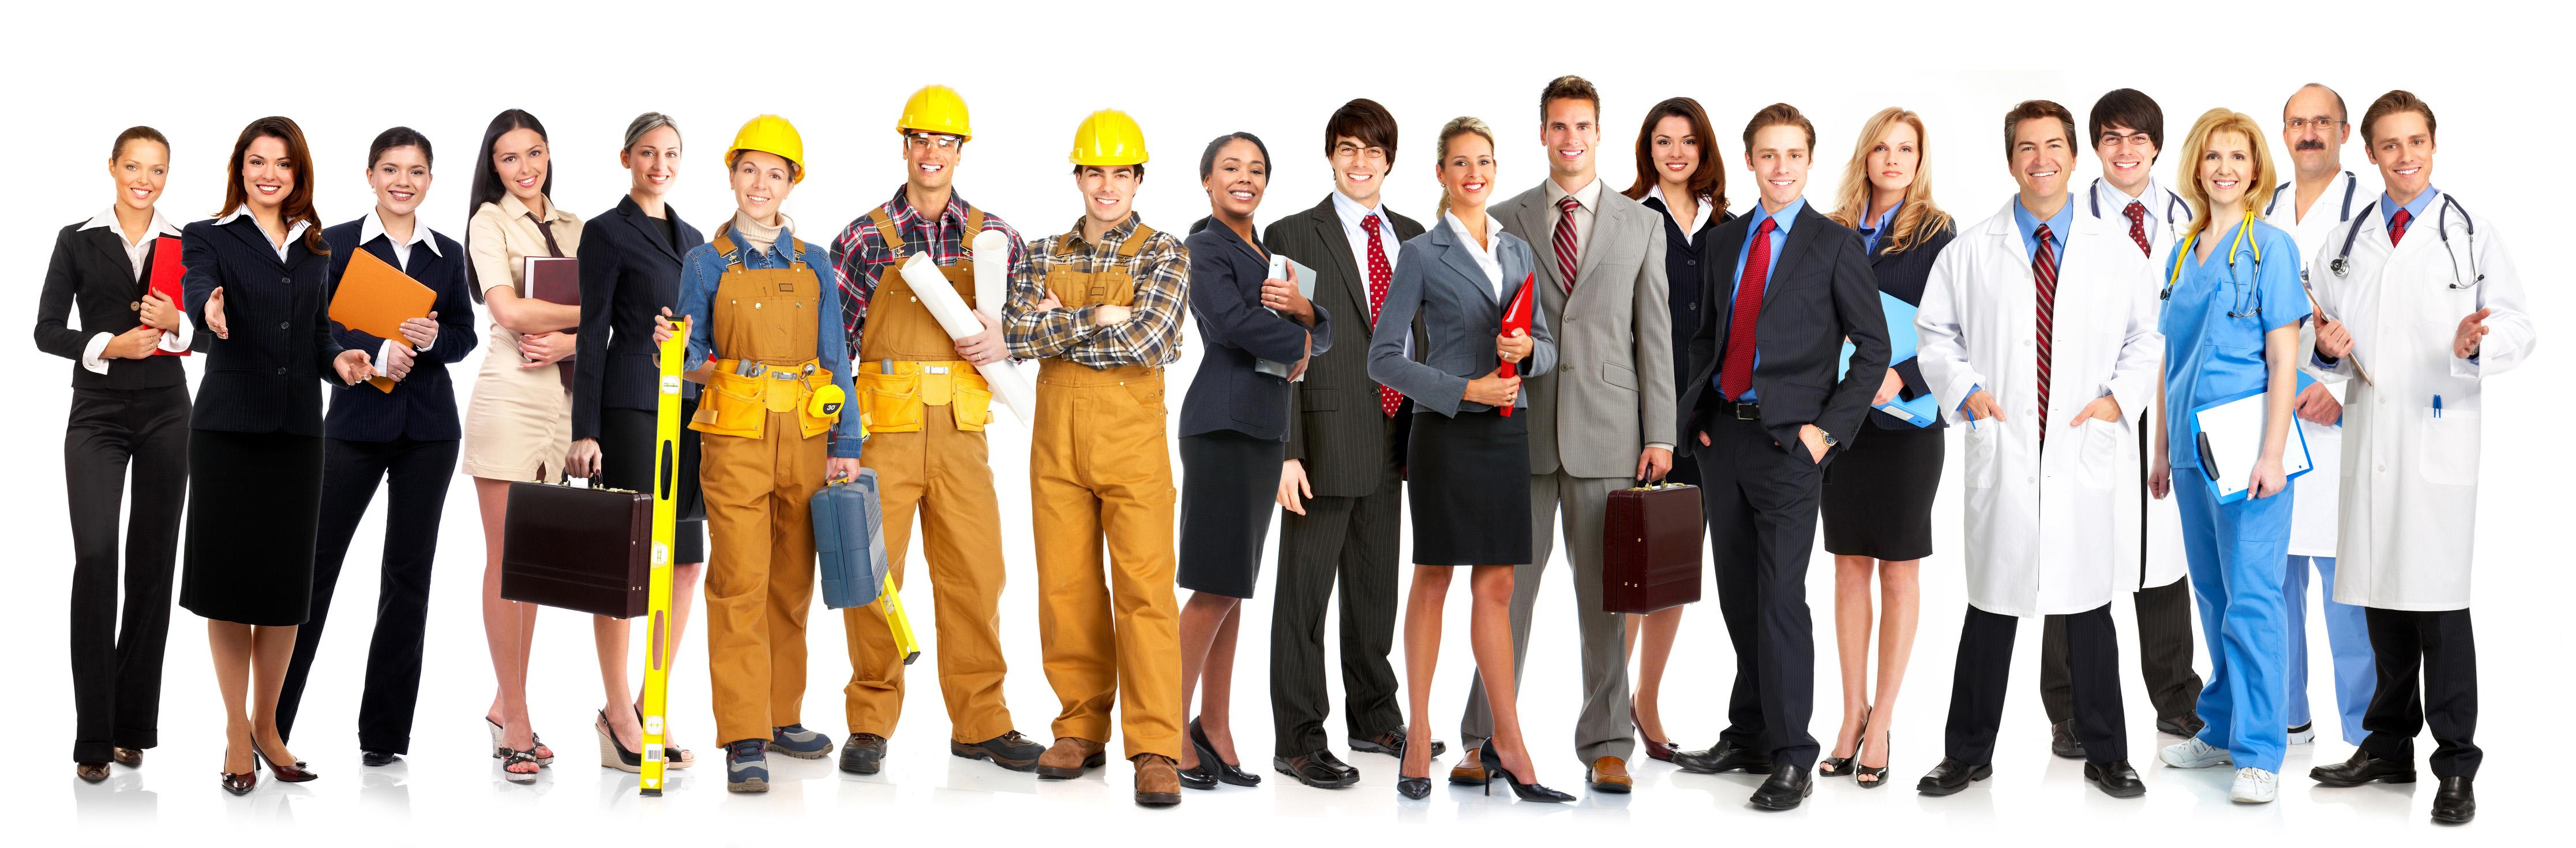 Workforce Consultants image 4